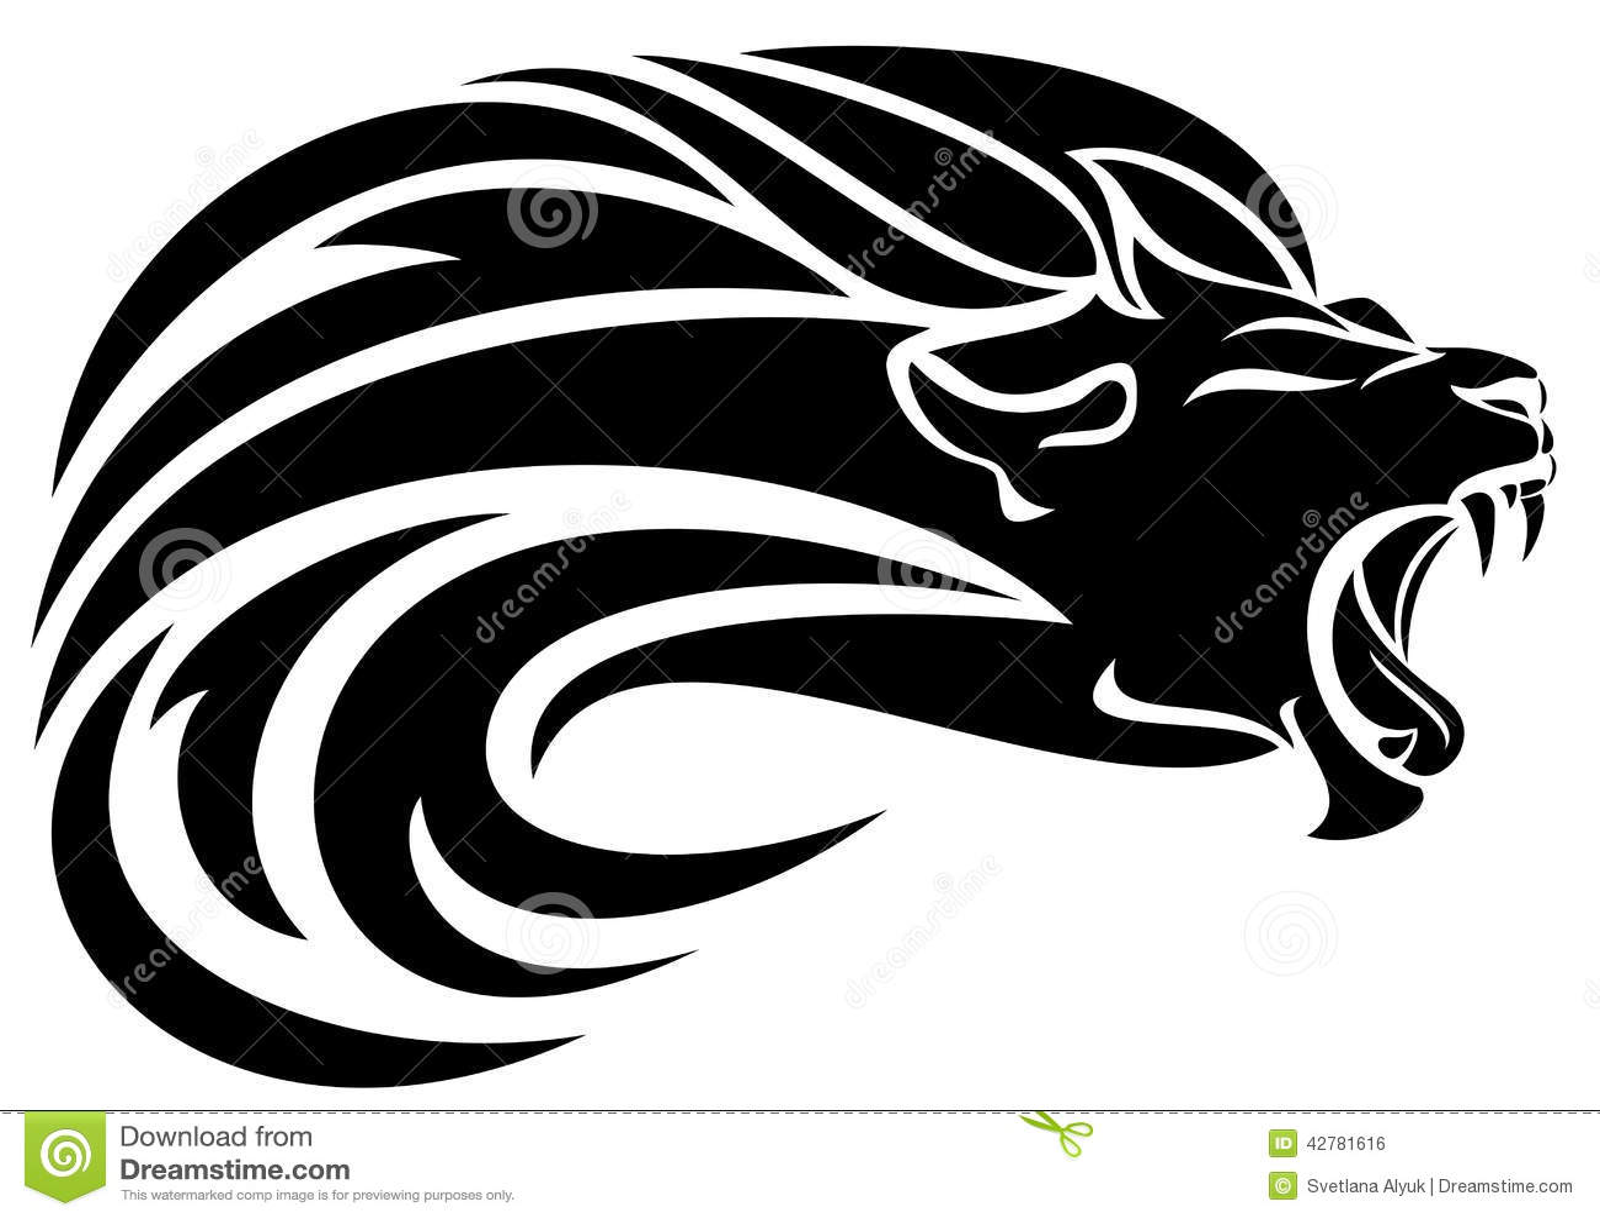 Lion head tribal design - black and white